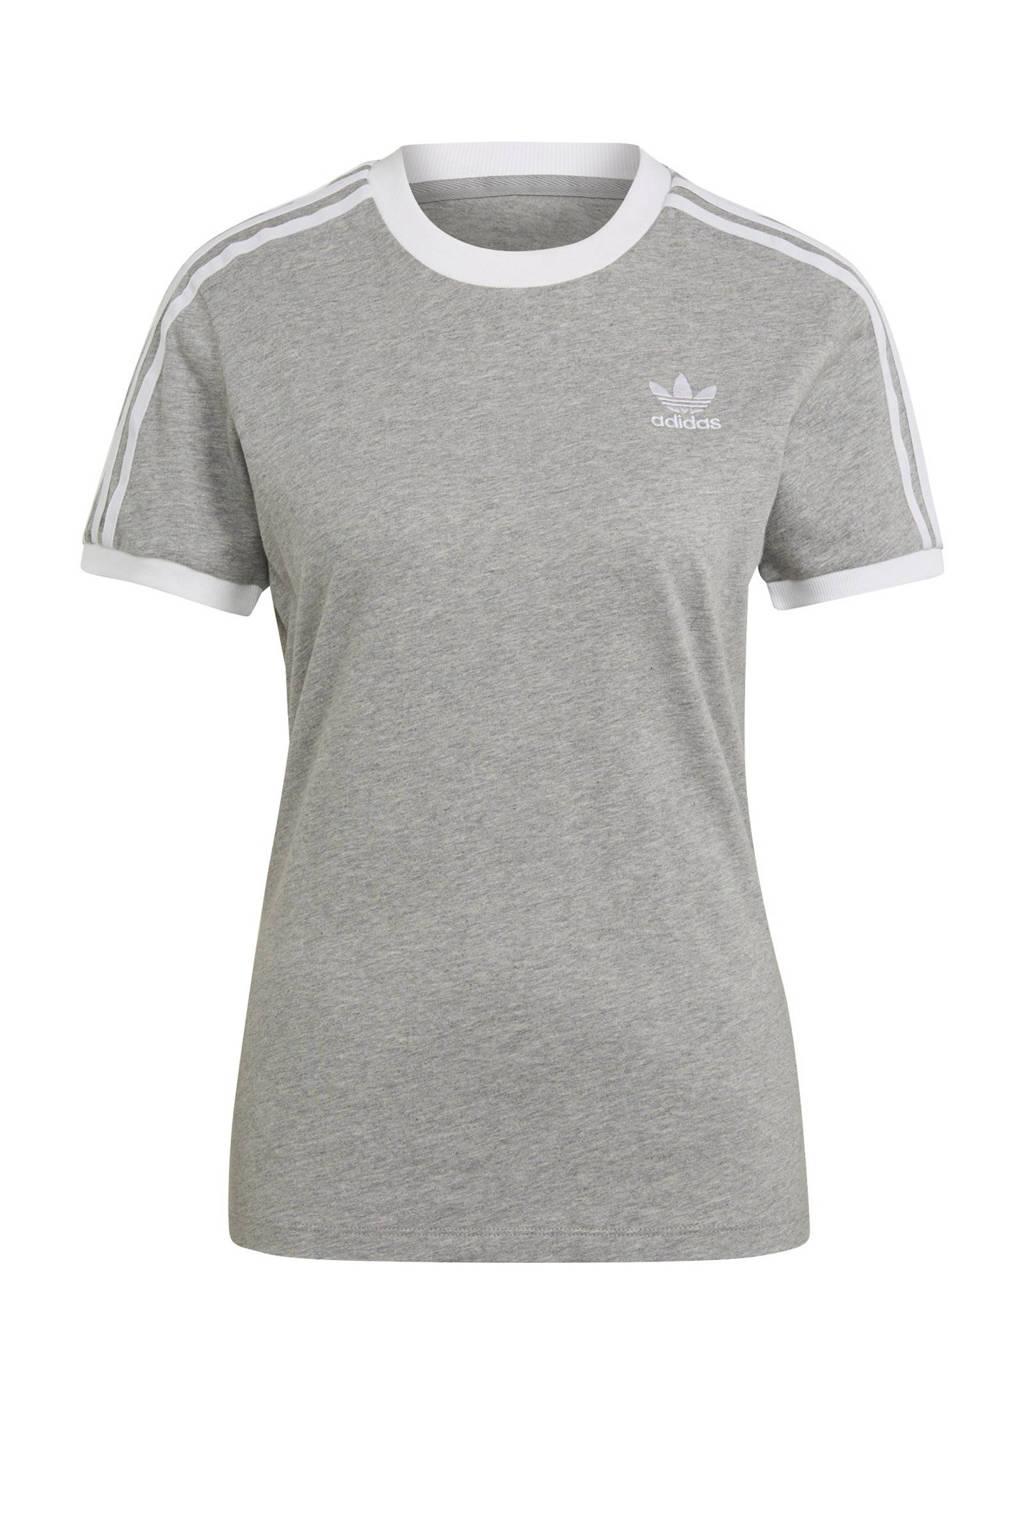 adidas Originals Adicolor T-shirt grijs/wit, Grijs melange